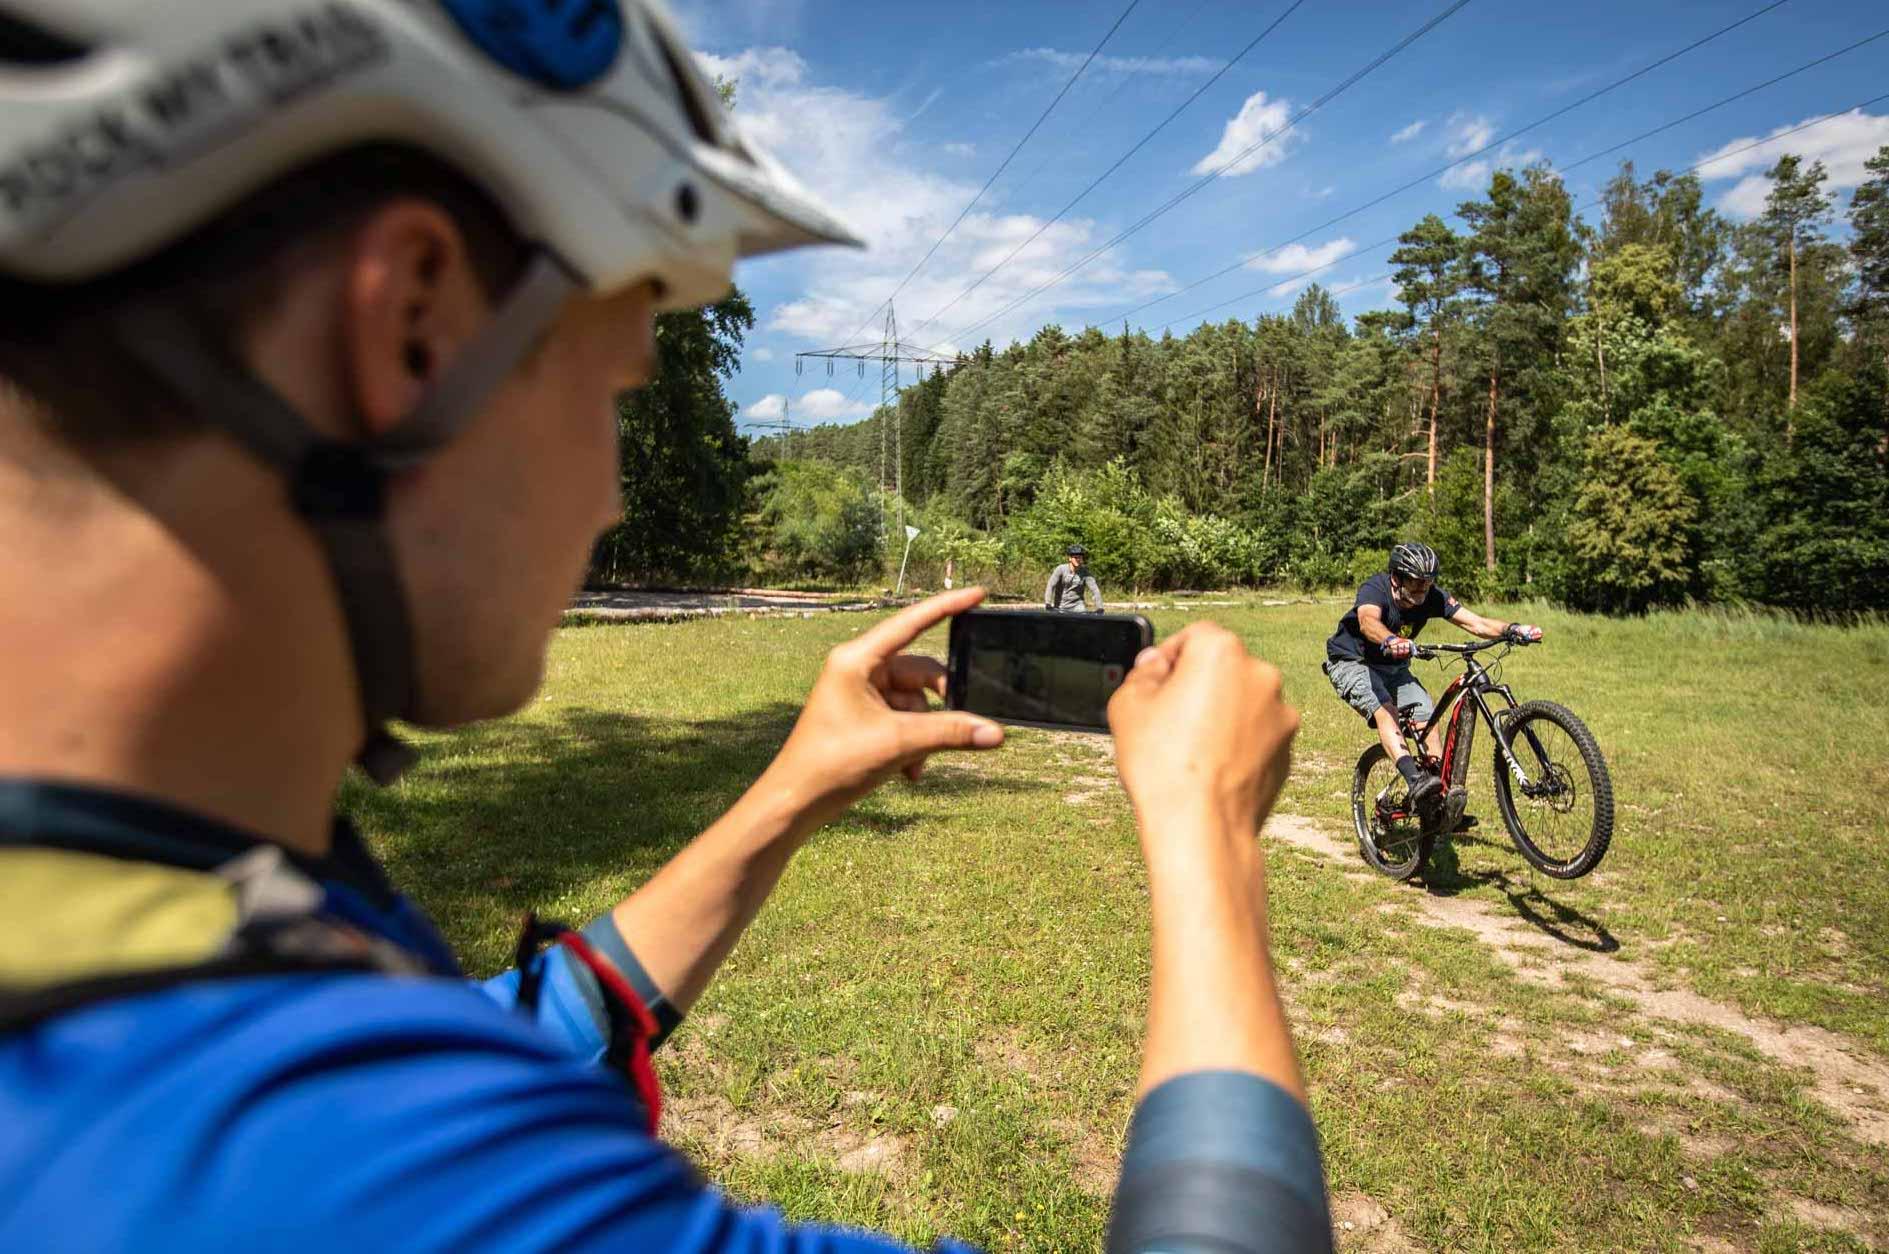 eMTB Fortgeschritten Fahrtechnik Kurs in Freiburg - Schwarzwald Breisgau Schlossberg - Rock my Trail Bikeschule